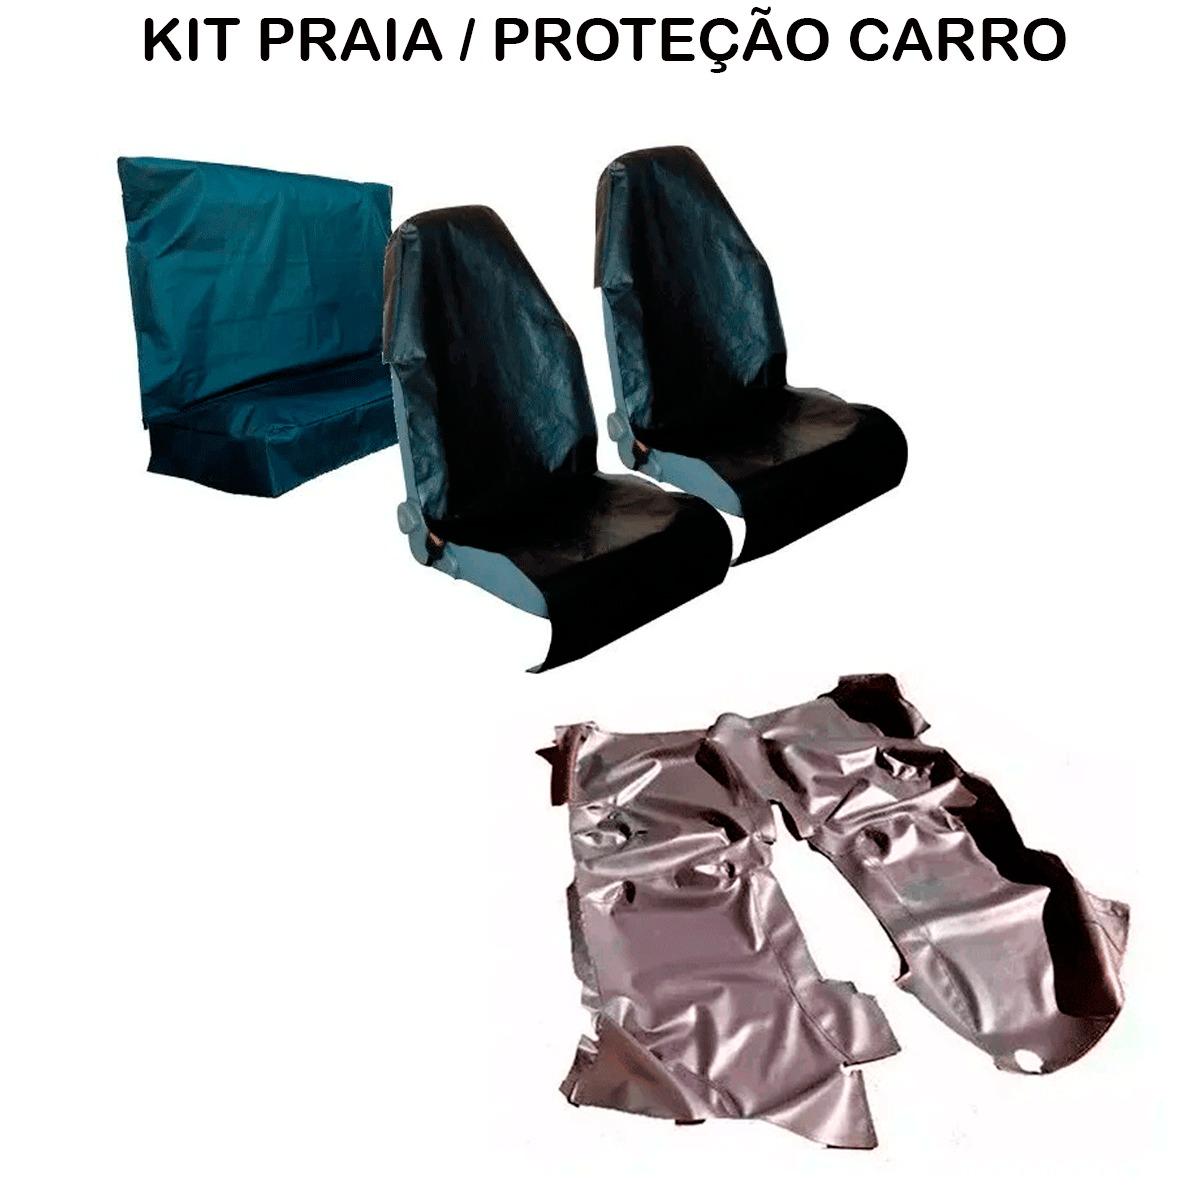 Tapete Em Vinil Nissan Frontier Dupla Sel Navarra 2008 a 2011 + Capa Banco Protecao Banco Areia Suor Academia